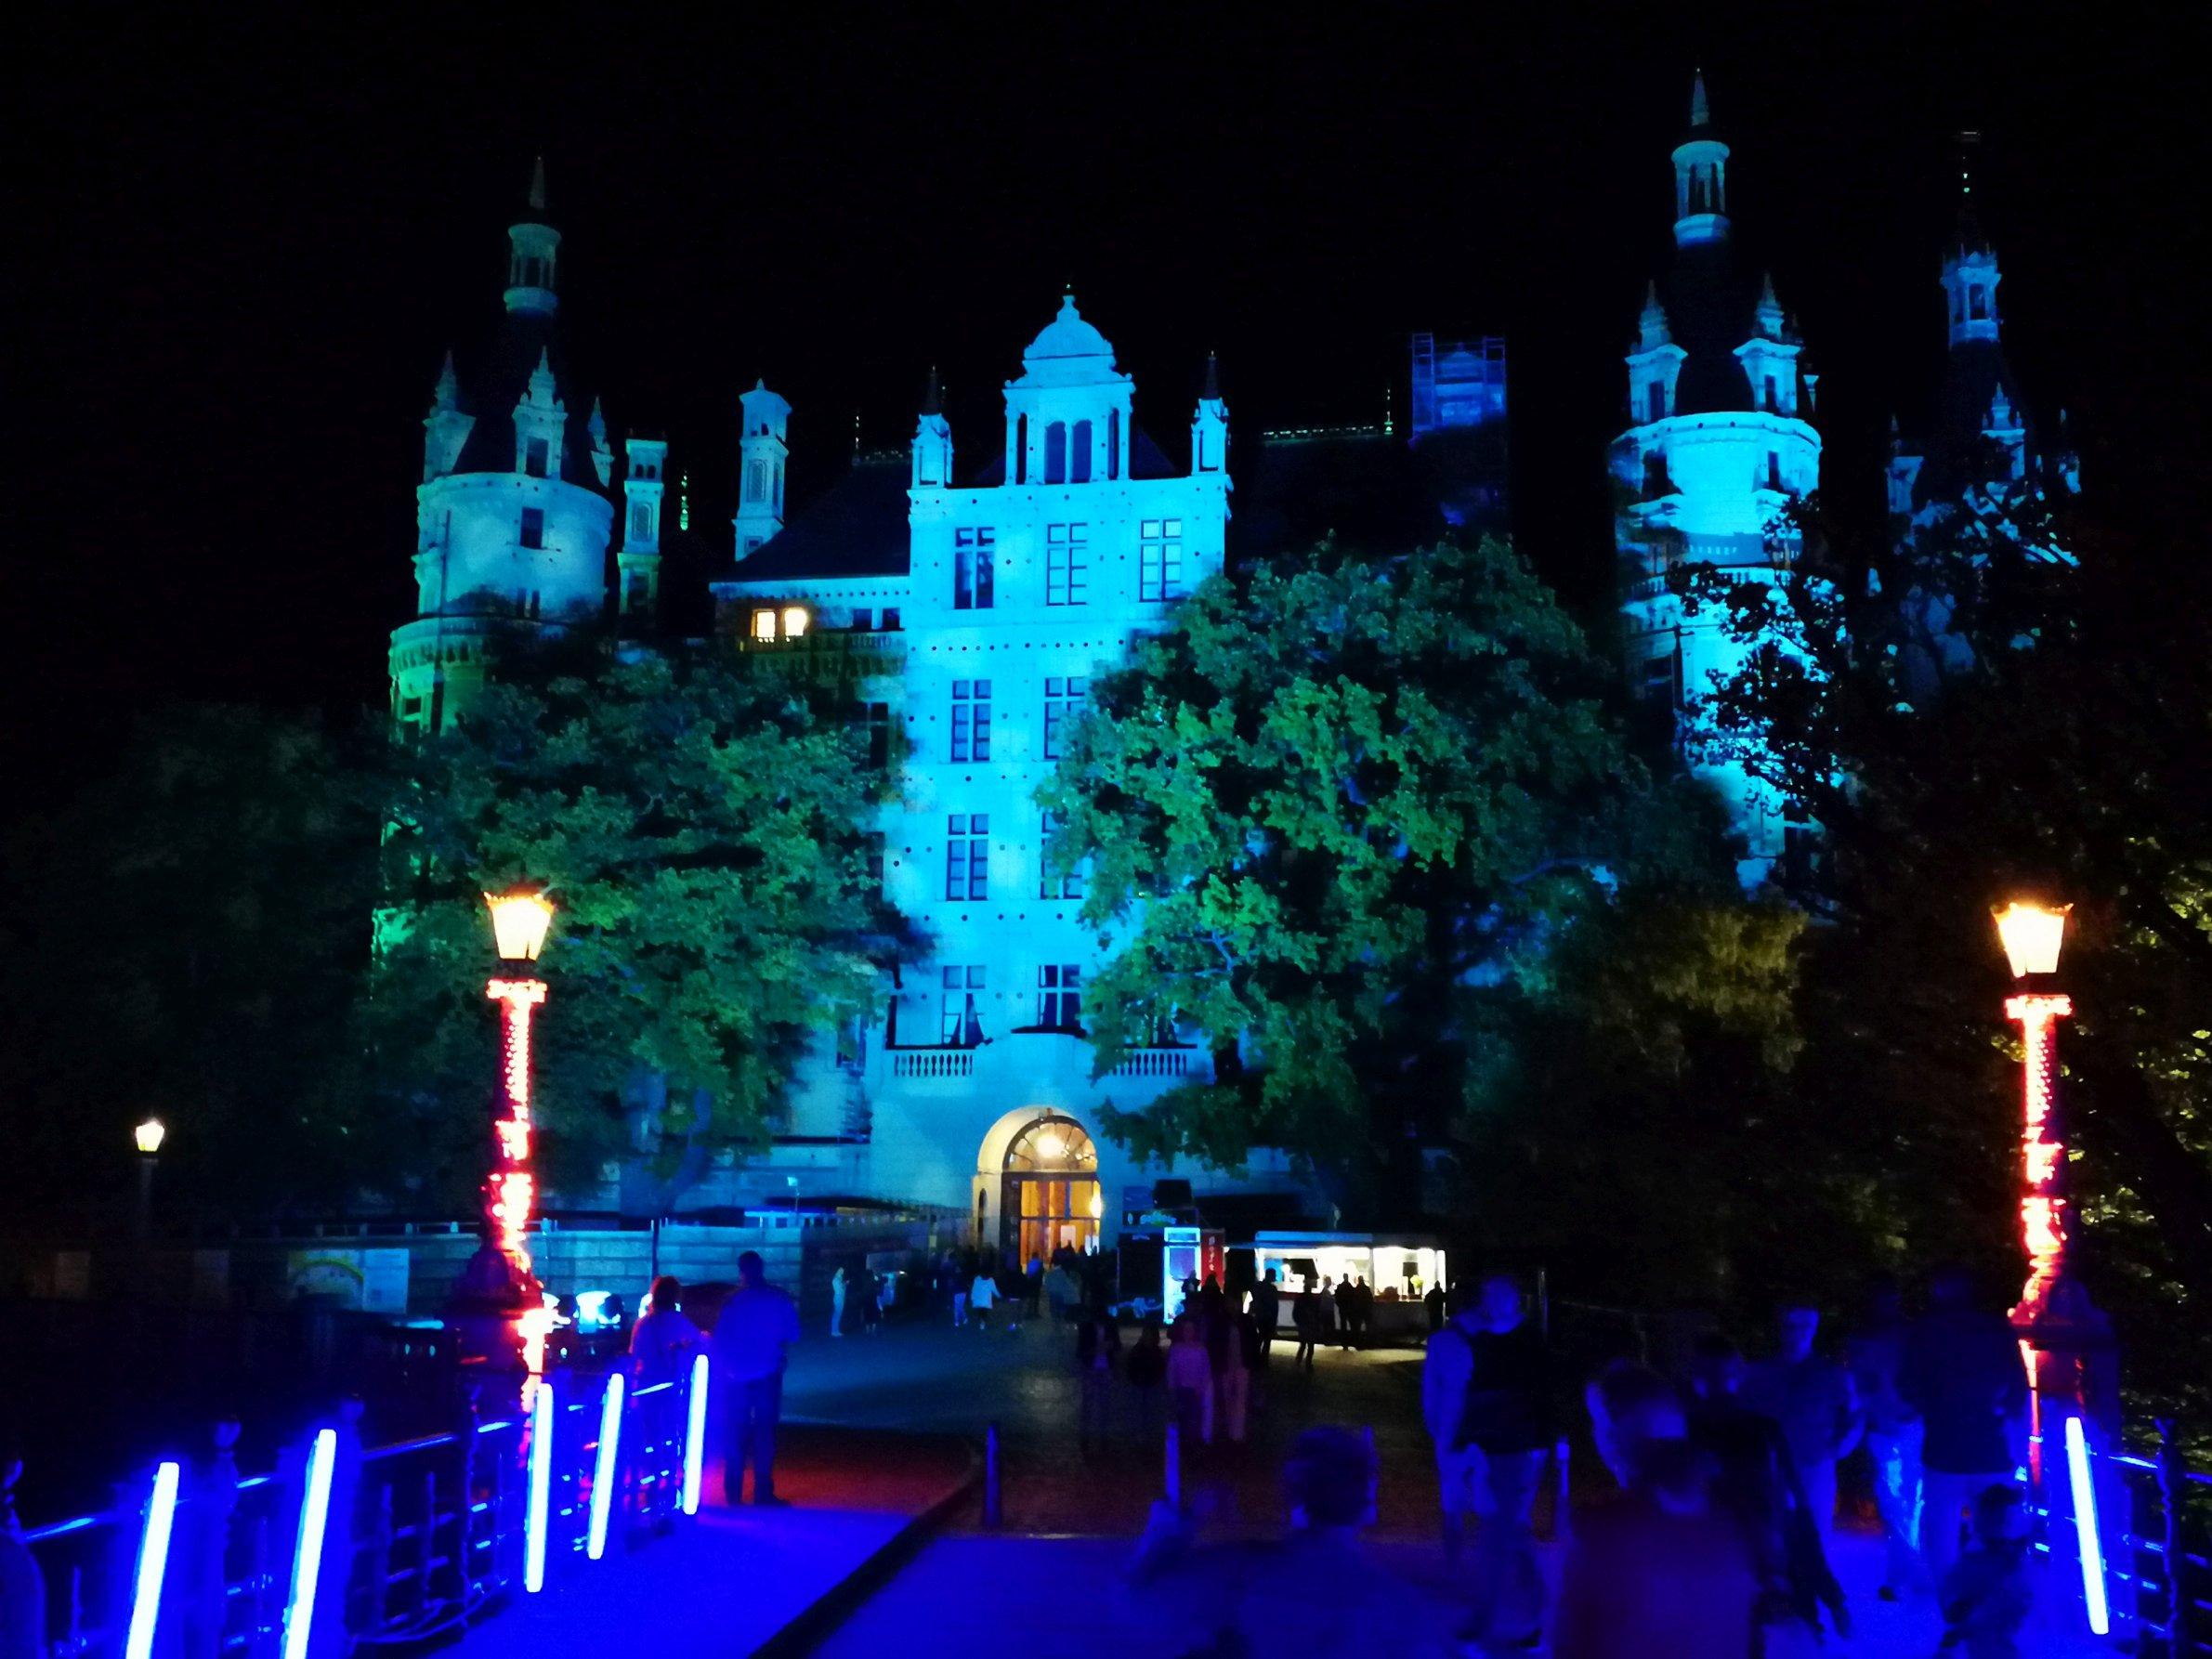 Schlossgartenlust_2019_Schwerinl_IMG_20190803_230901